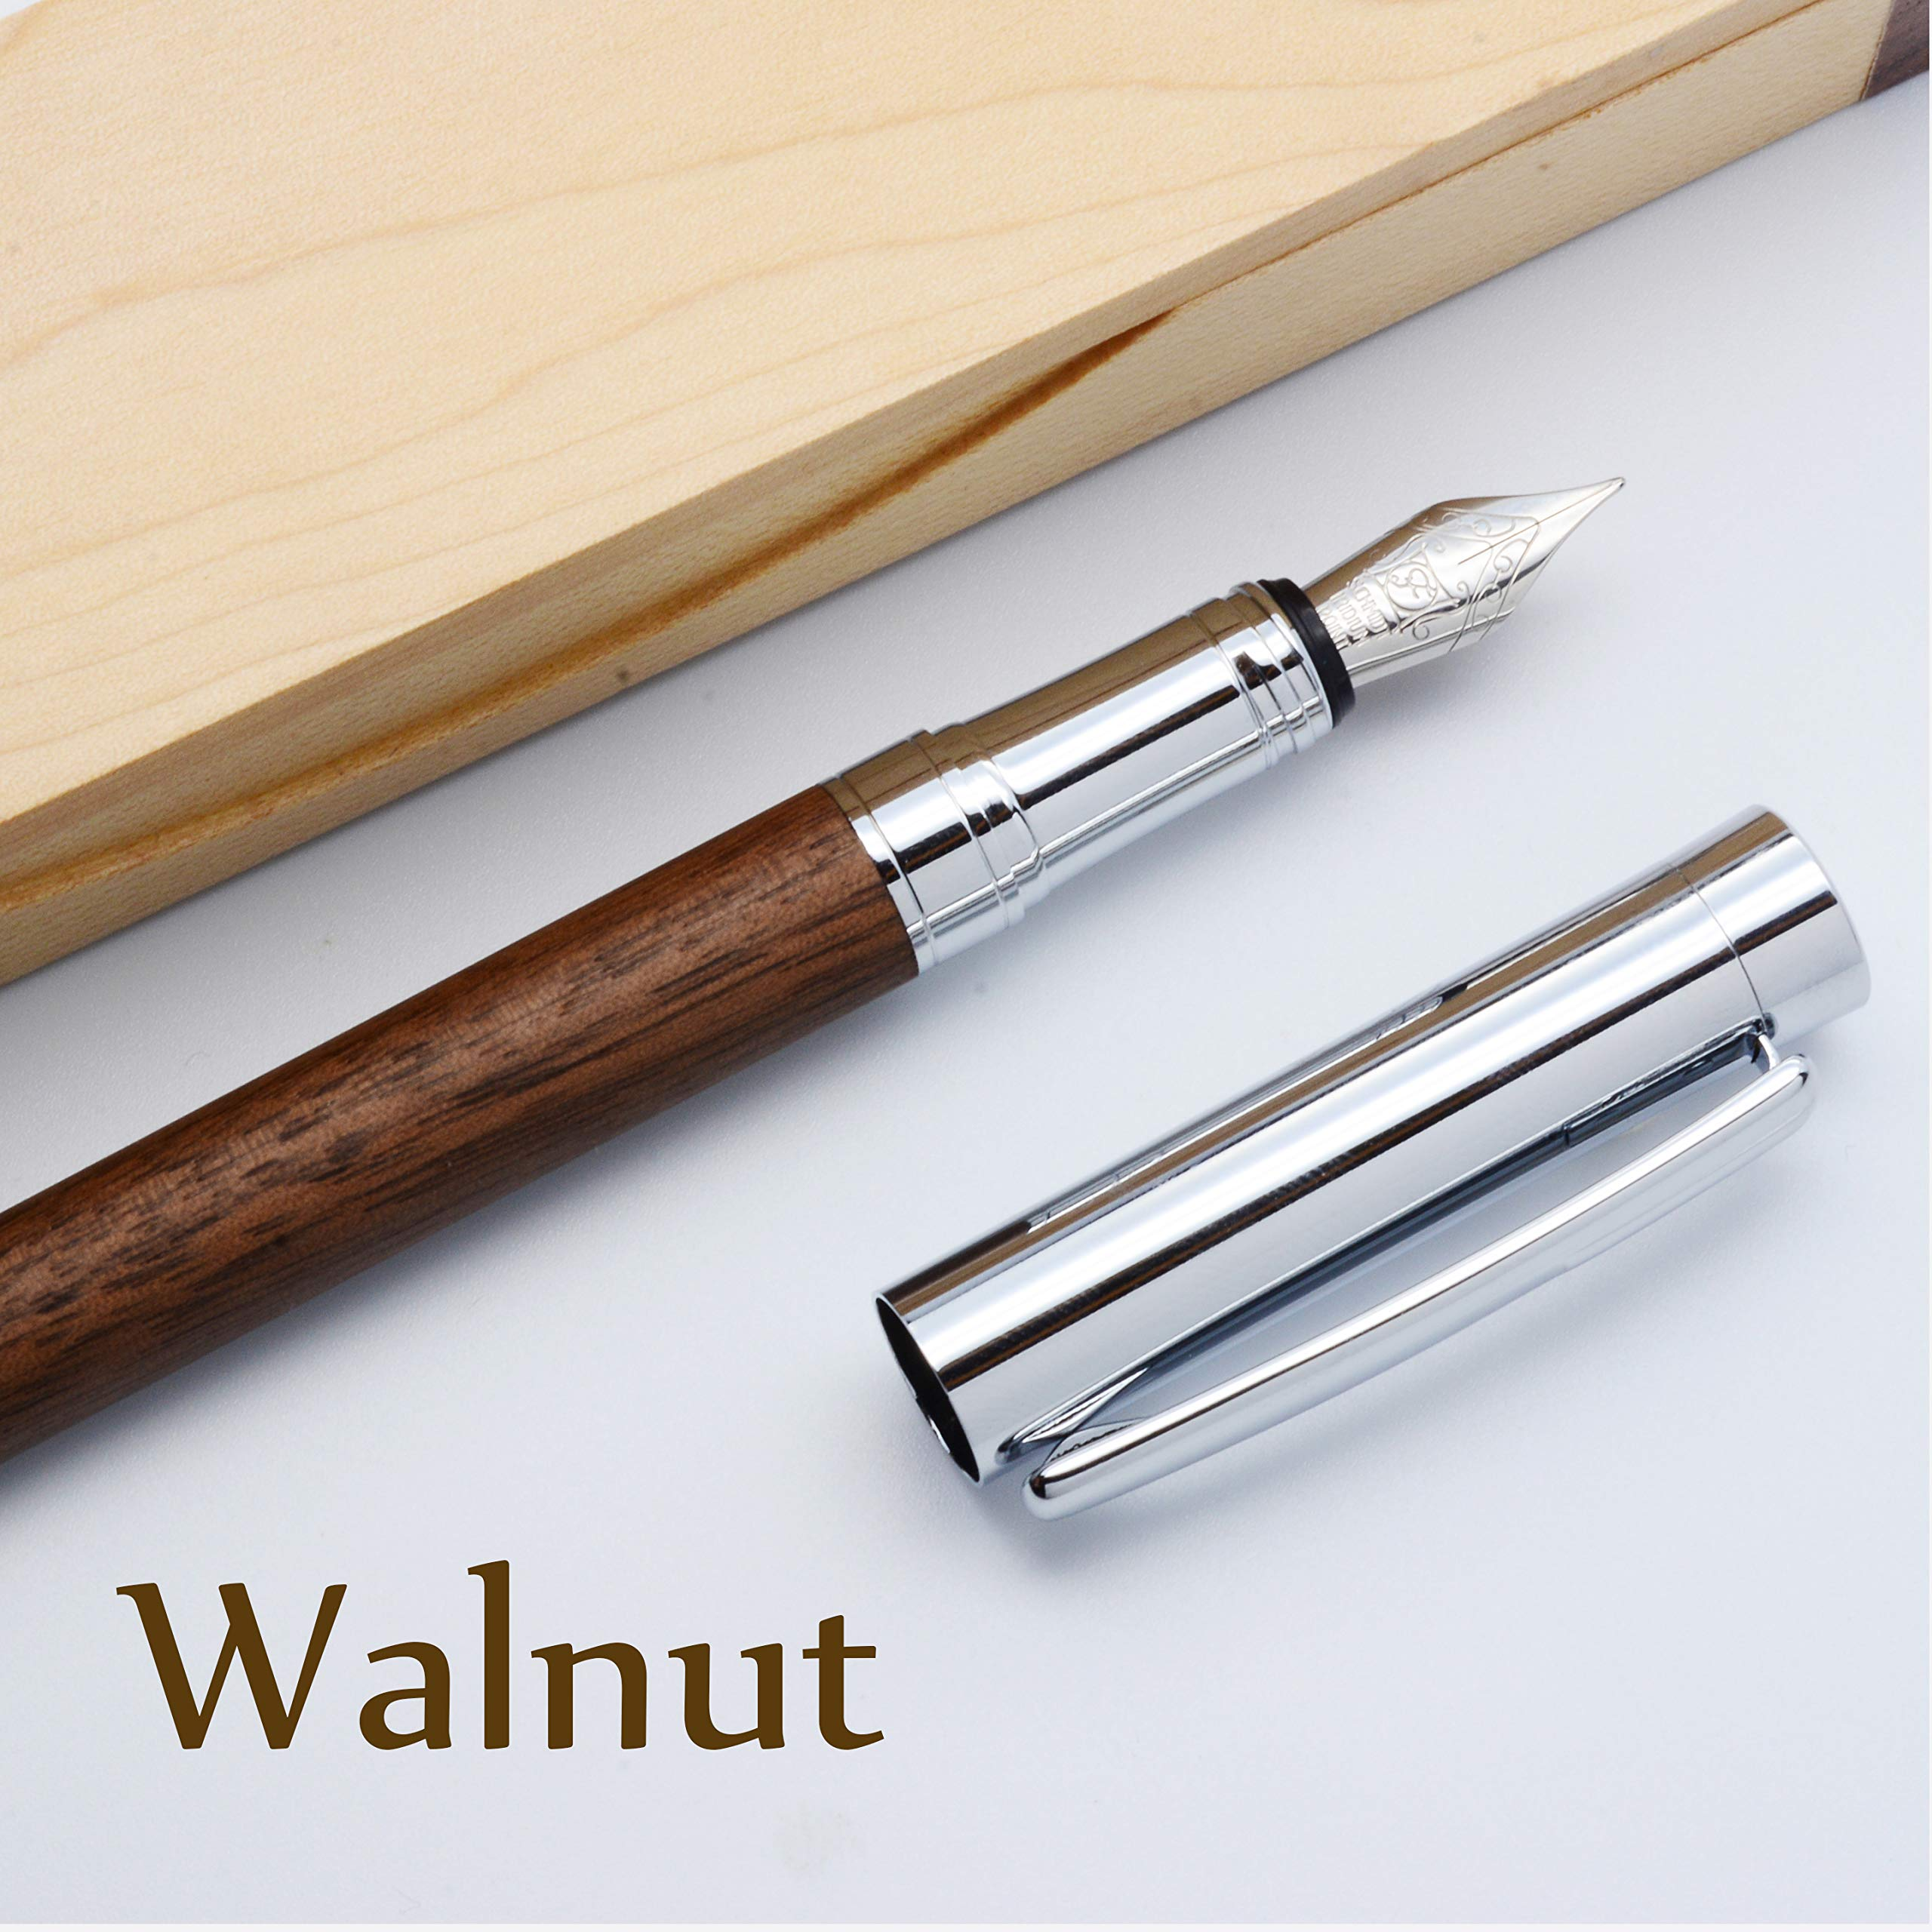 LACHIEVA Luxury Walnut Fountain Pen with Elegant Box Pack Germany Schmidt''FINE'' Size Nib- Perfect for Gifts (Walnut) by LACHIEVA (Image #1)